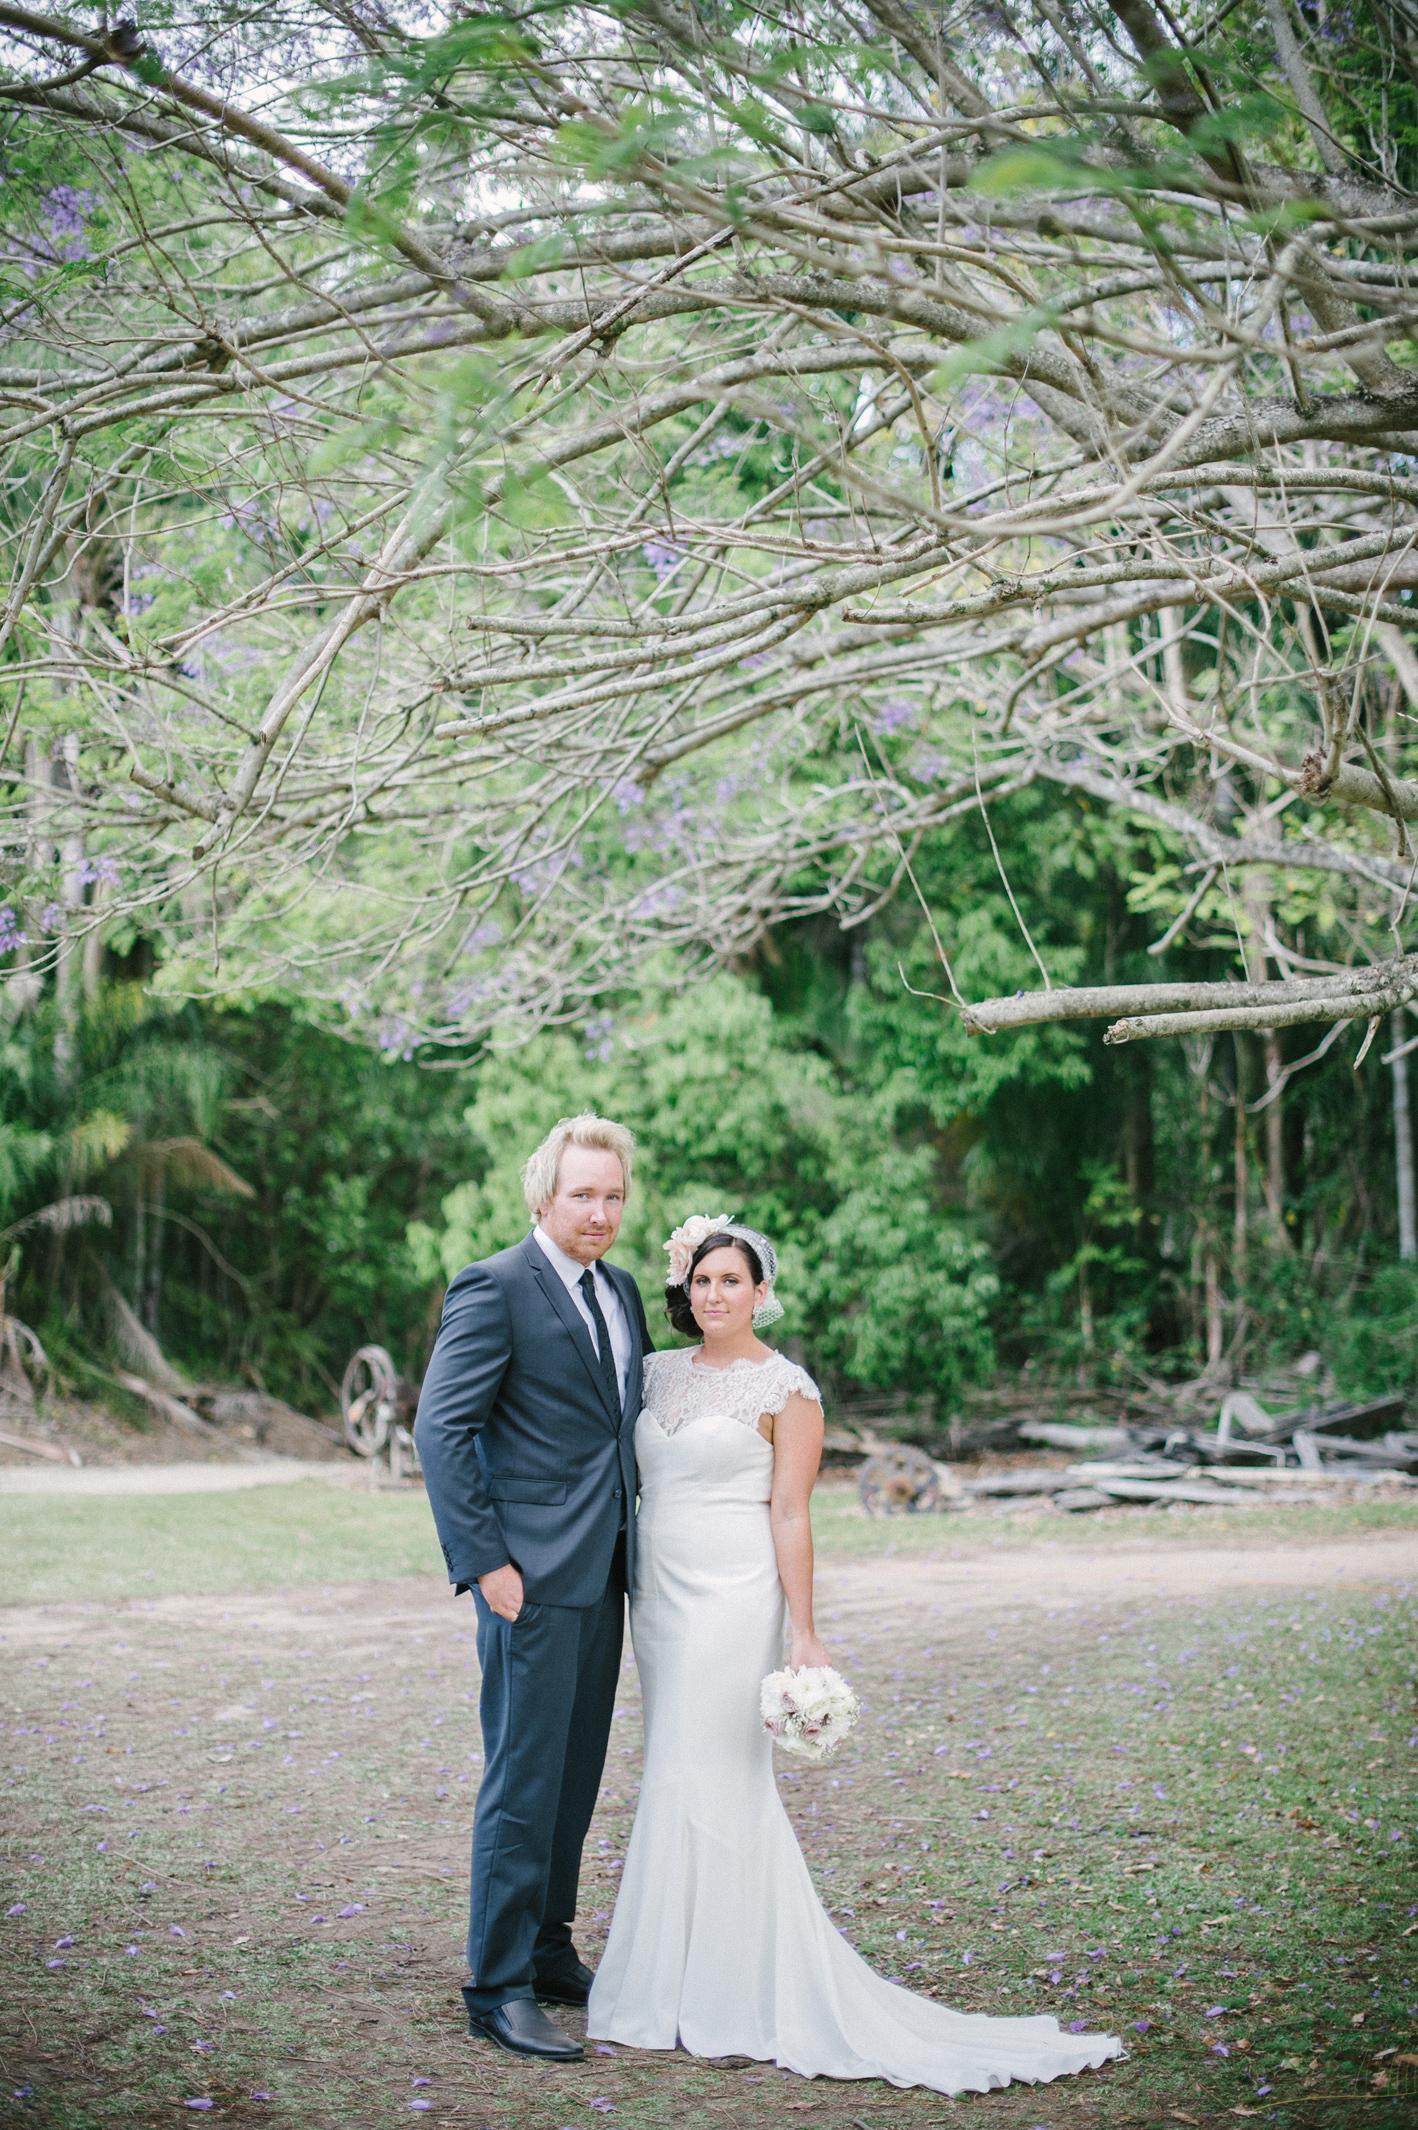 059-hannah-daniel-boomerang-farm-wedding-sophie-baker-photography